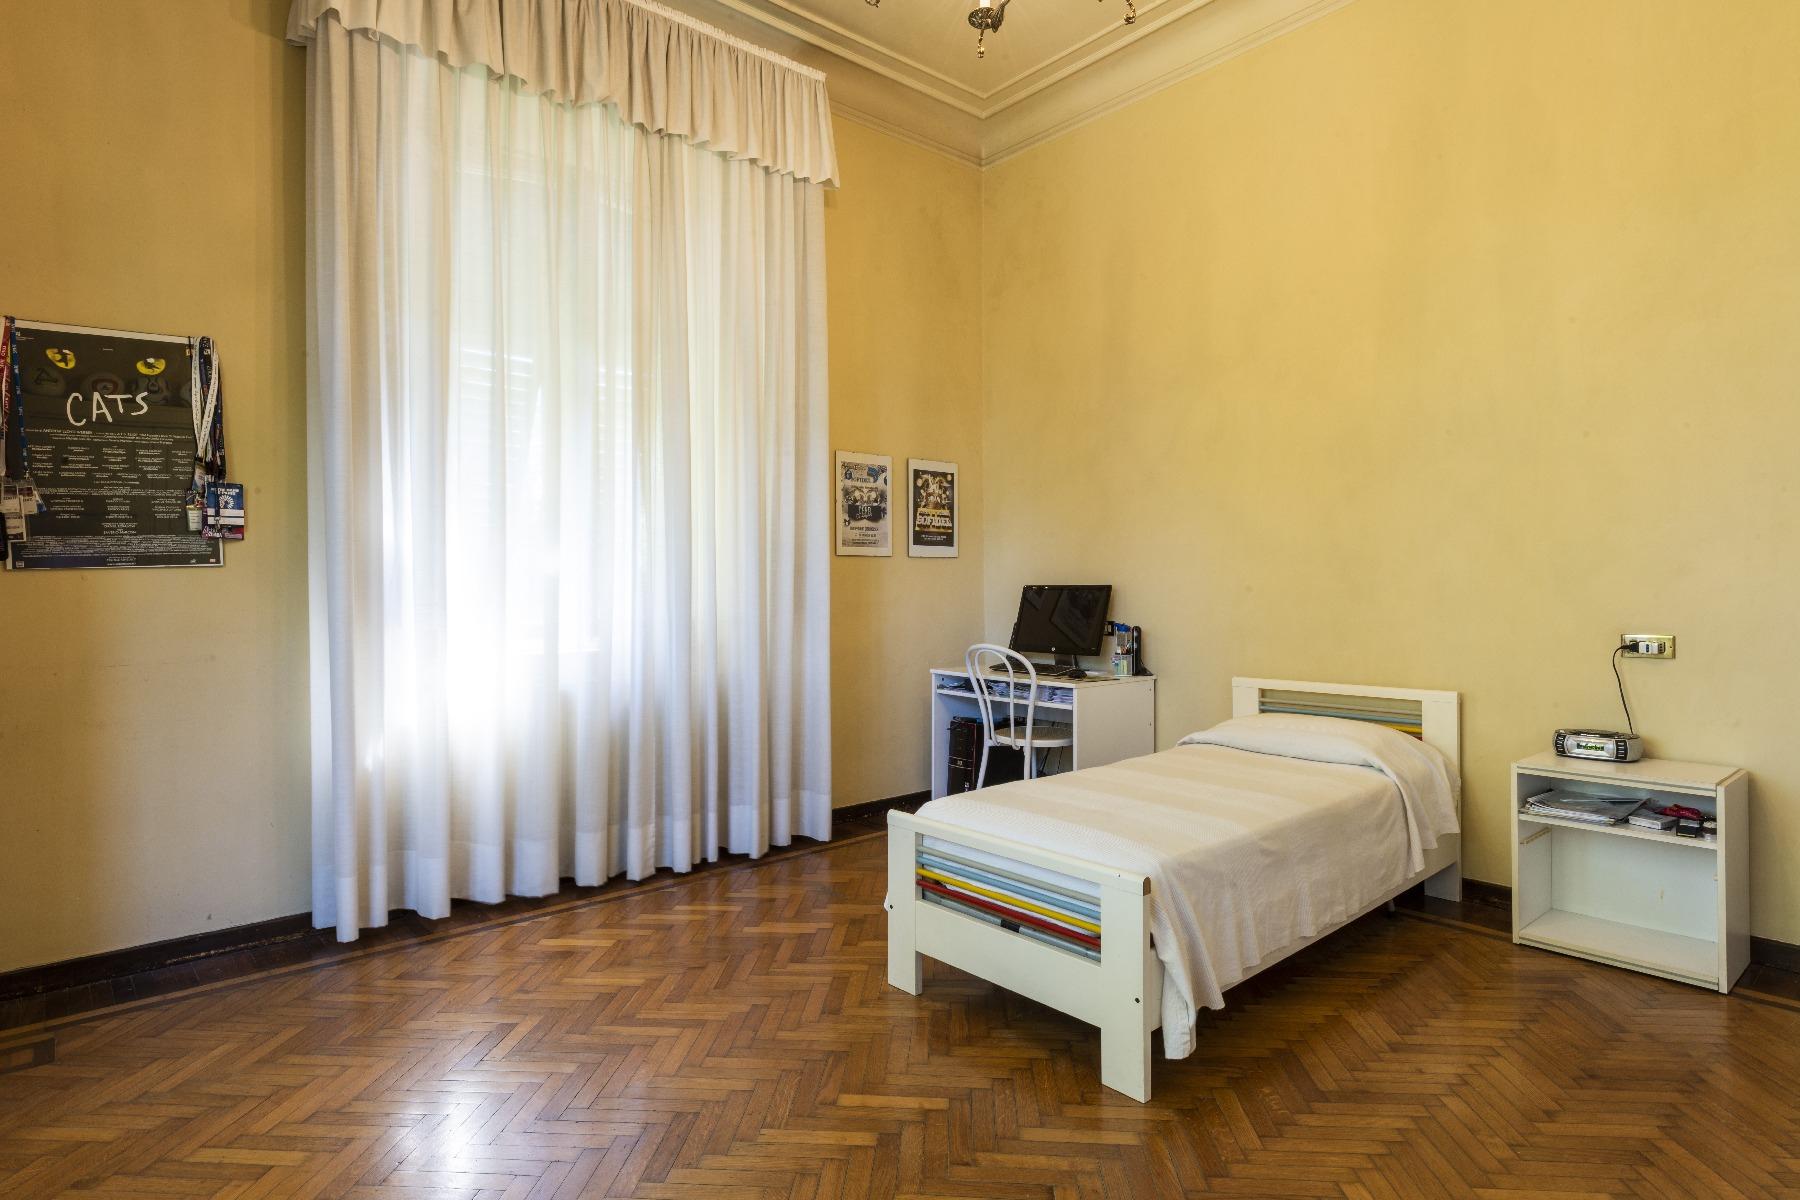 Villa in Vendita a Lucca: 5 locali, 660 mq - Foto 14